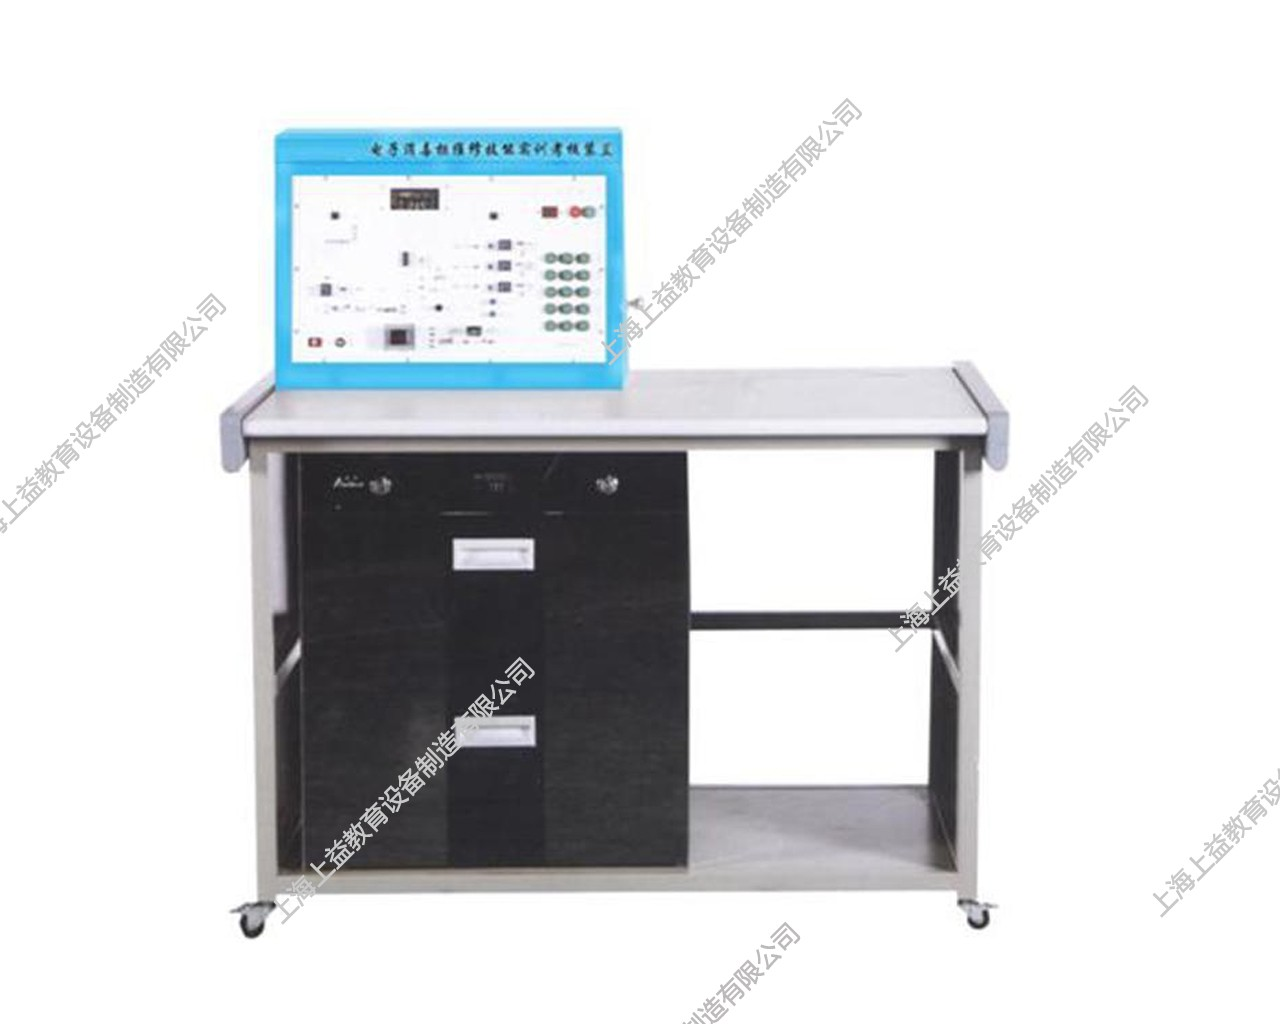 SYXD-02X型 电子消毒柜维修技能wwwlehu8viplehu68vip装置